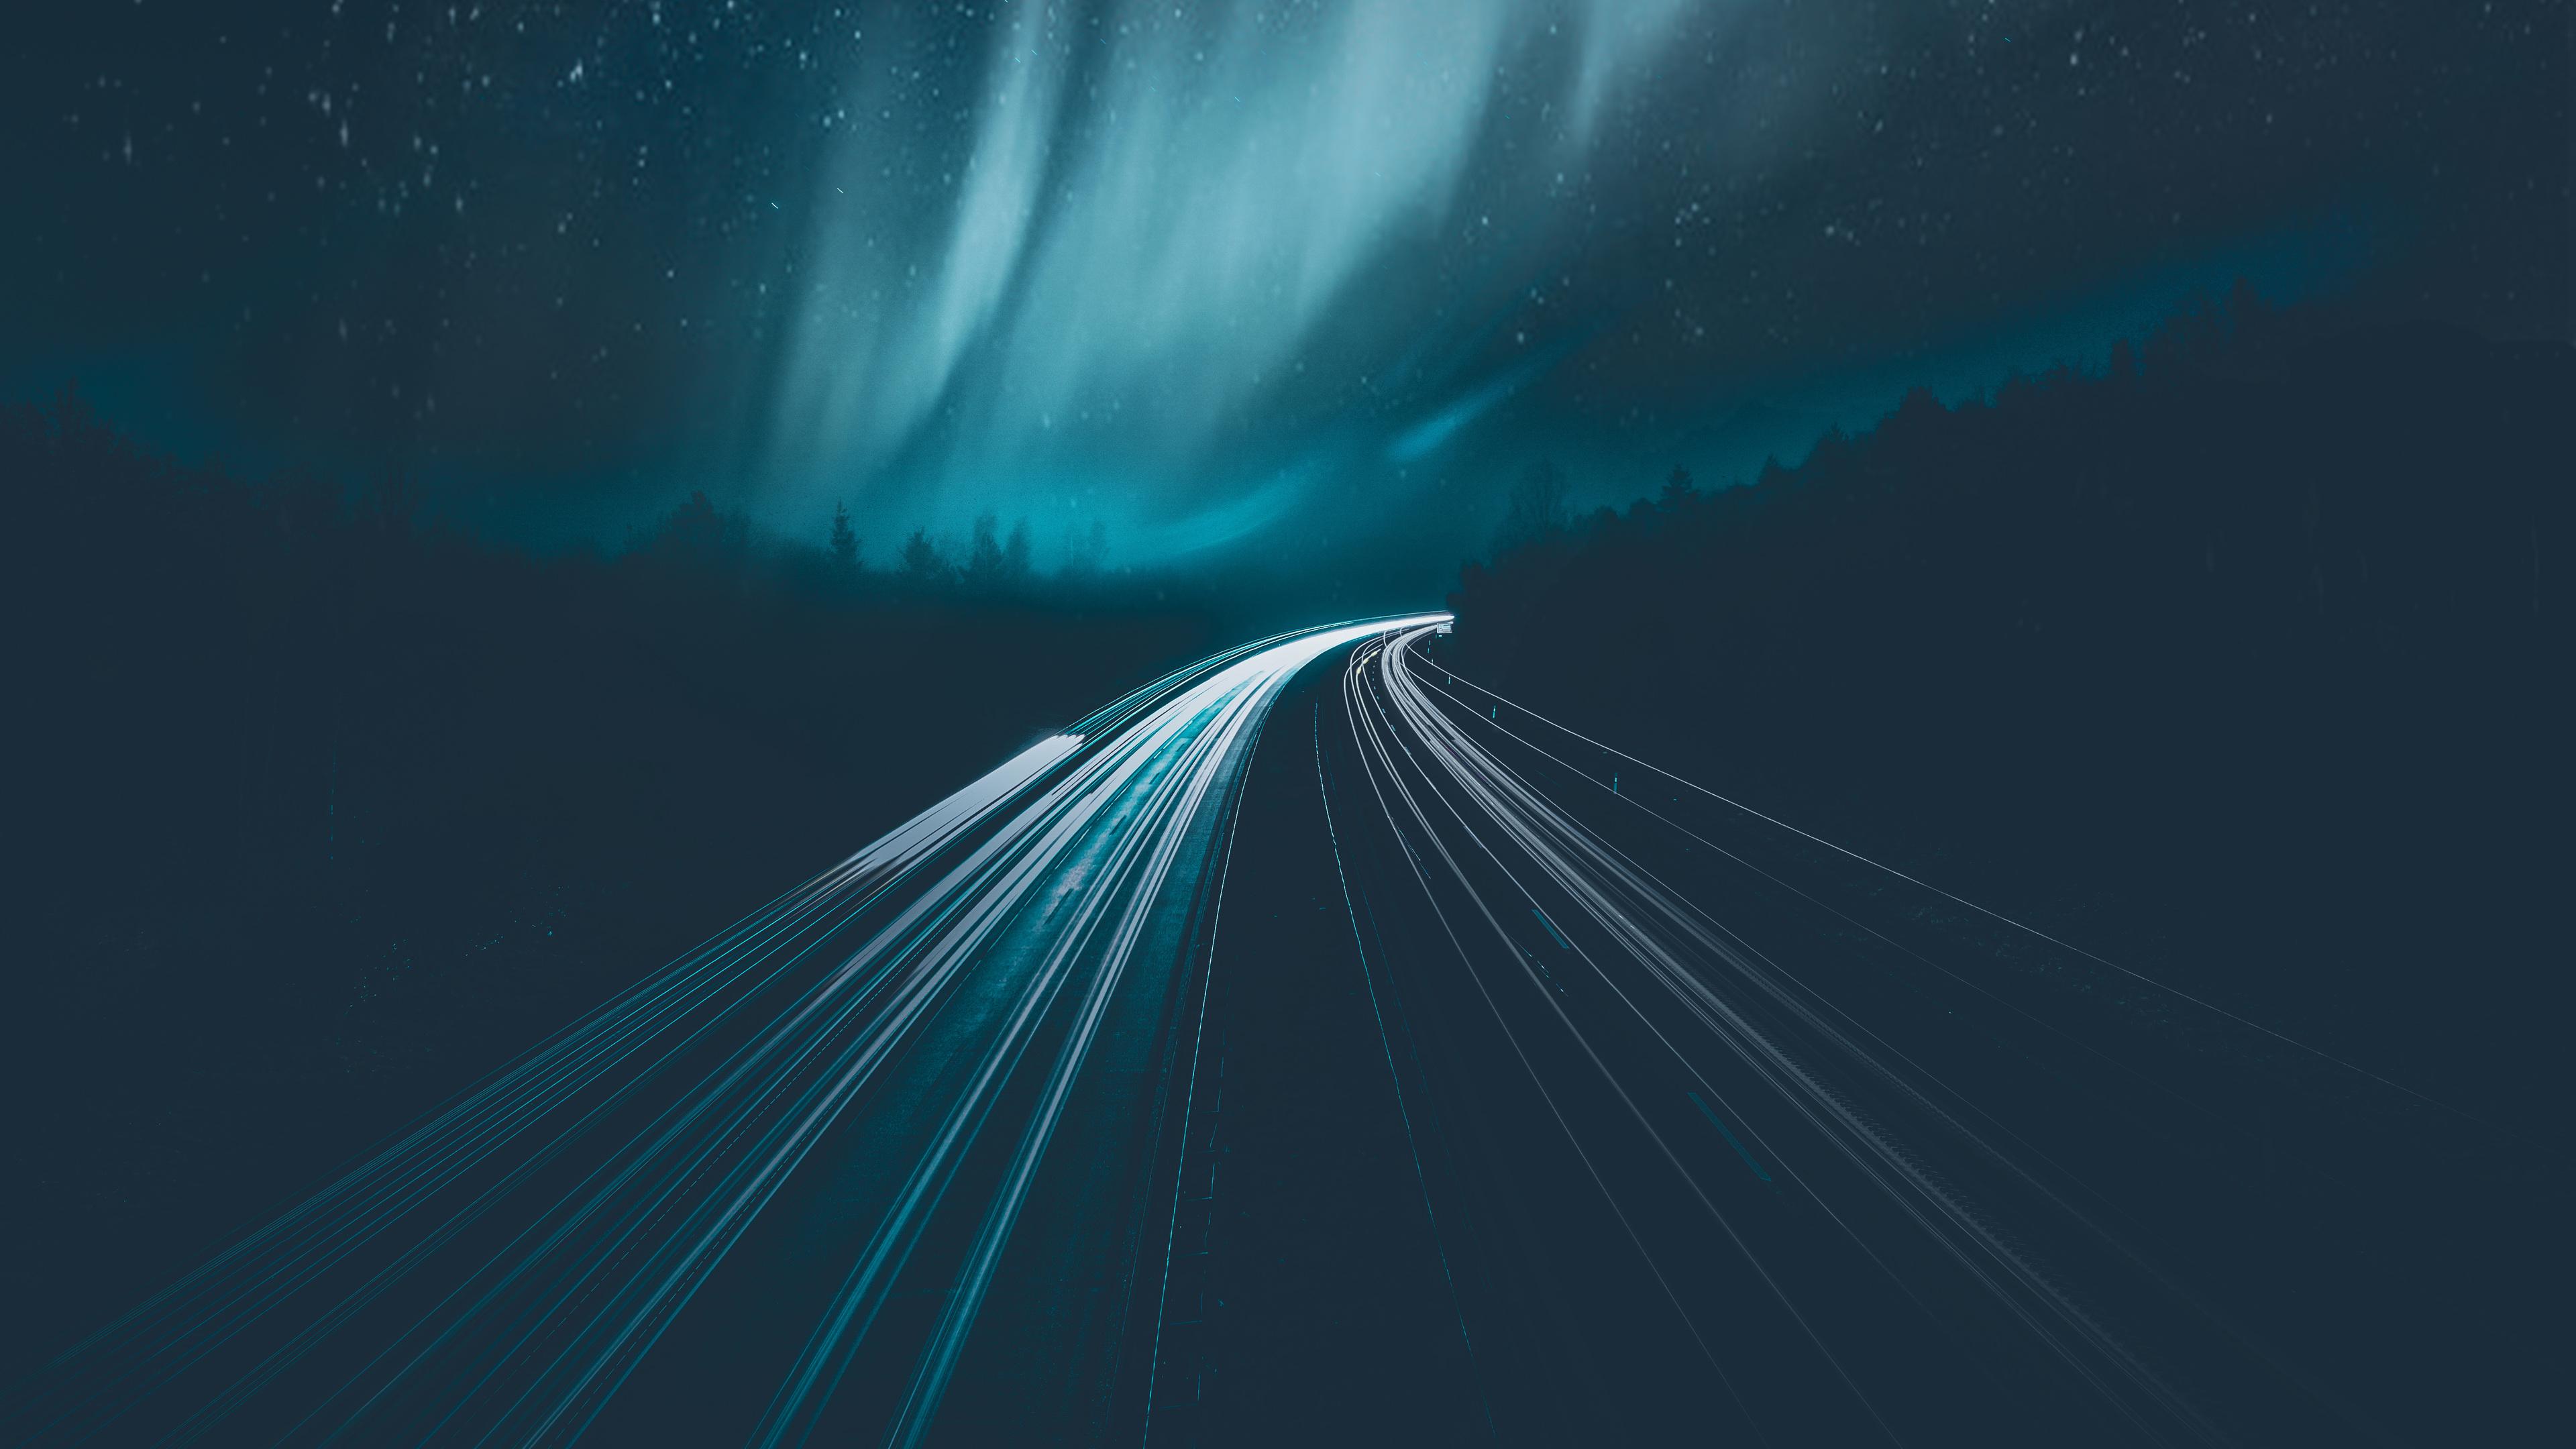 aurora borealis during night time 4k 1540136345 - Aurora Borealis During Night Time 4k - time lapse wallpapers, road wallpapers, nature wallpapers, hd-wallpapers, aurora wallpapers, 5k wallpapers, 4k-wallpapers